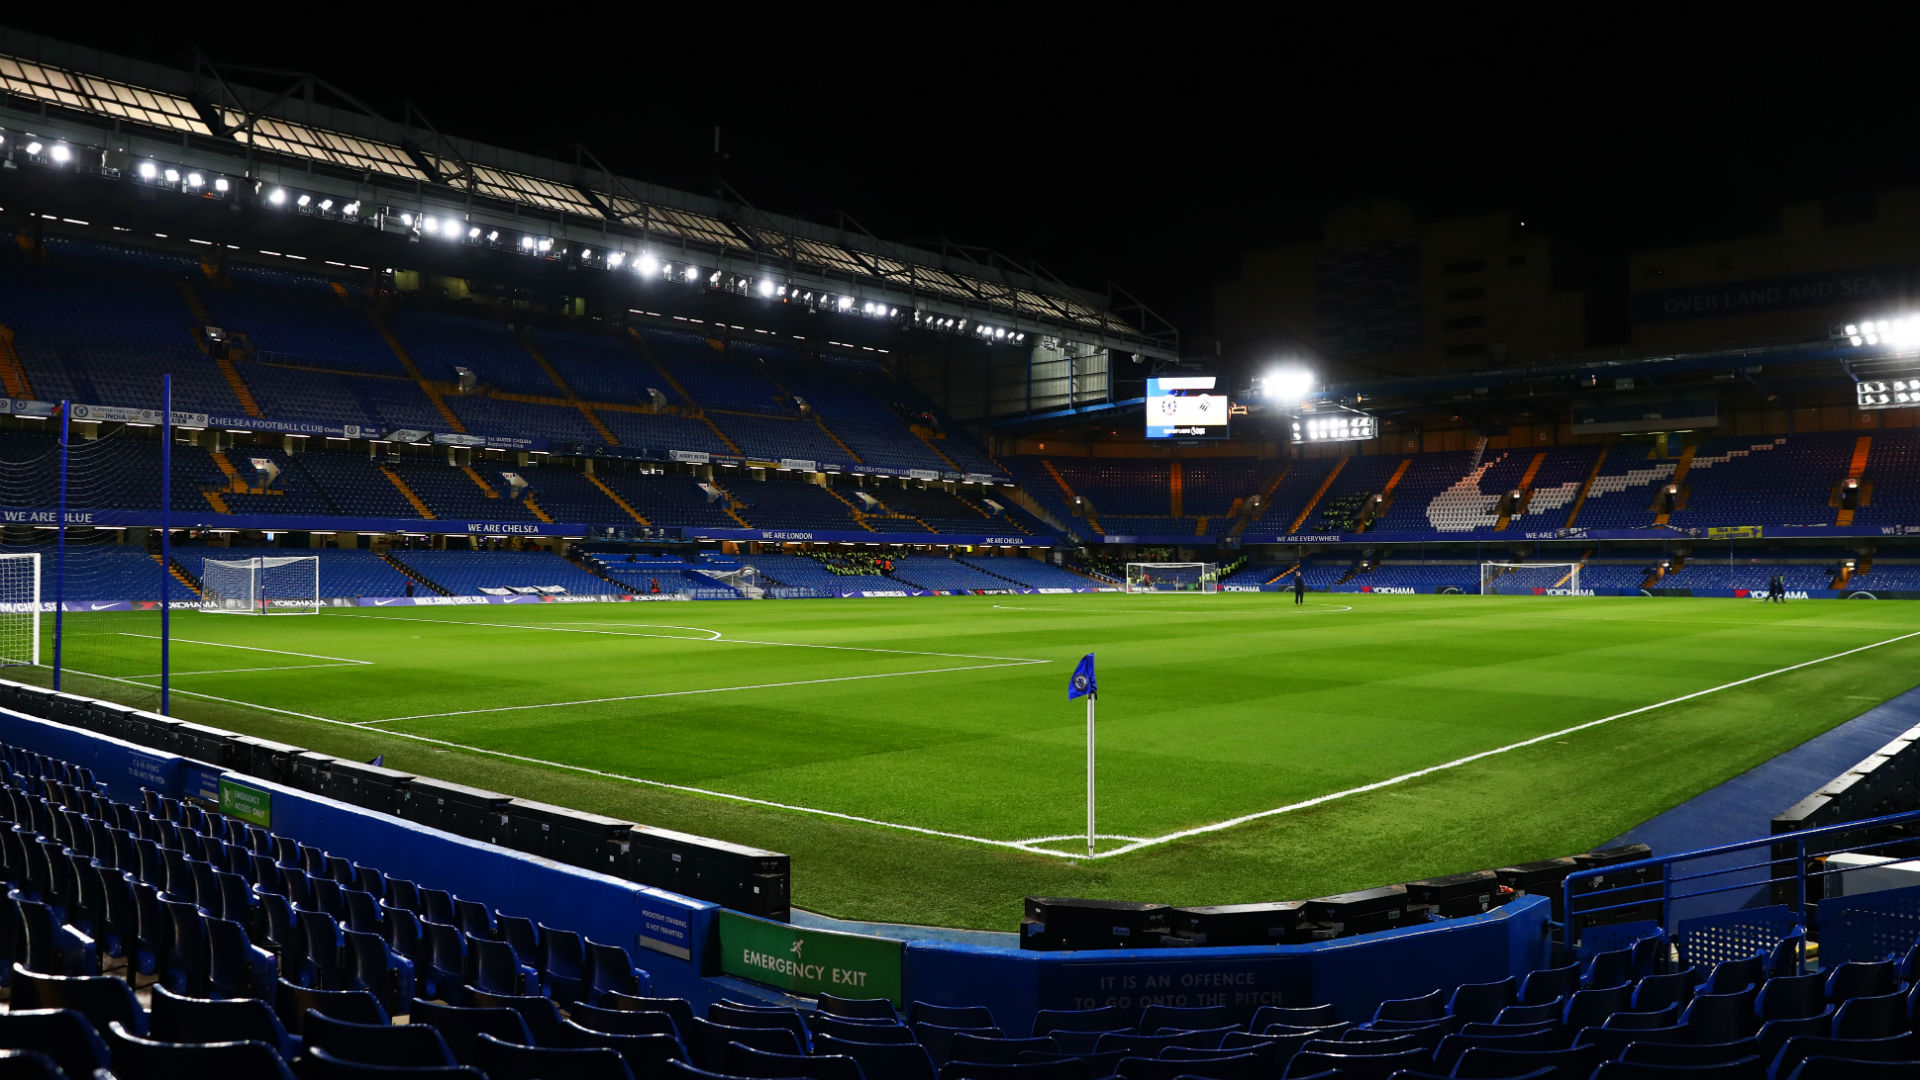 Stamford Bridge Chelsea general view